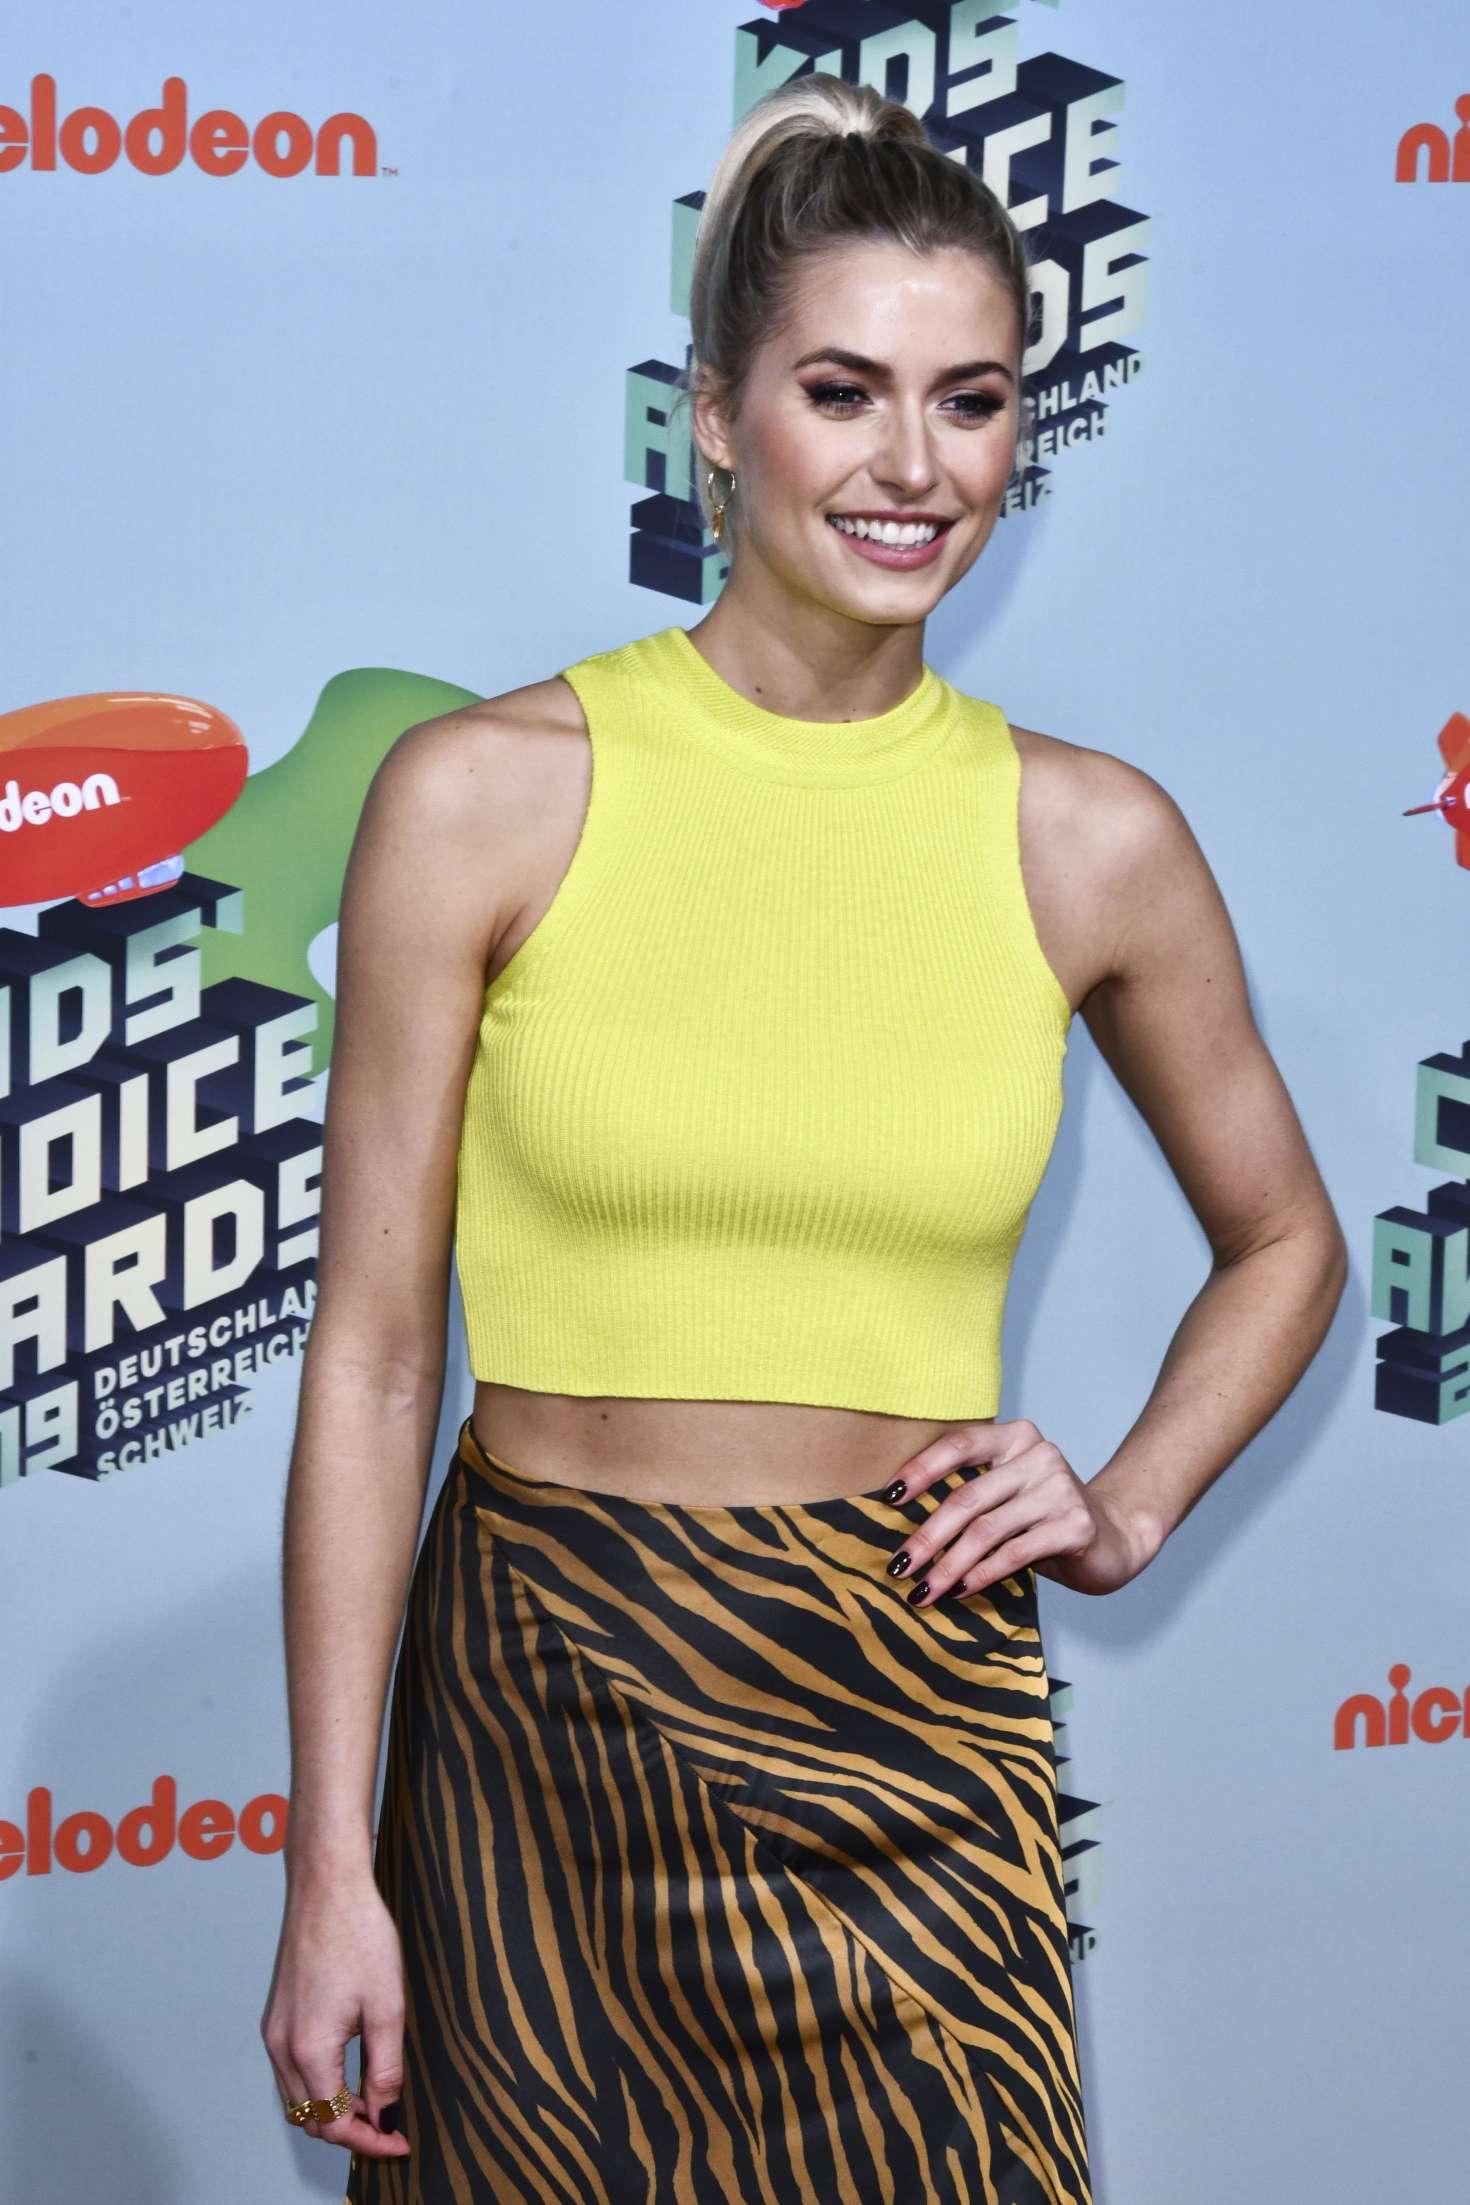 Lena Gercke - 2019 Nickelodeon Kids' Choice Awards in Rust